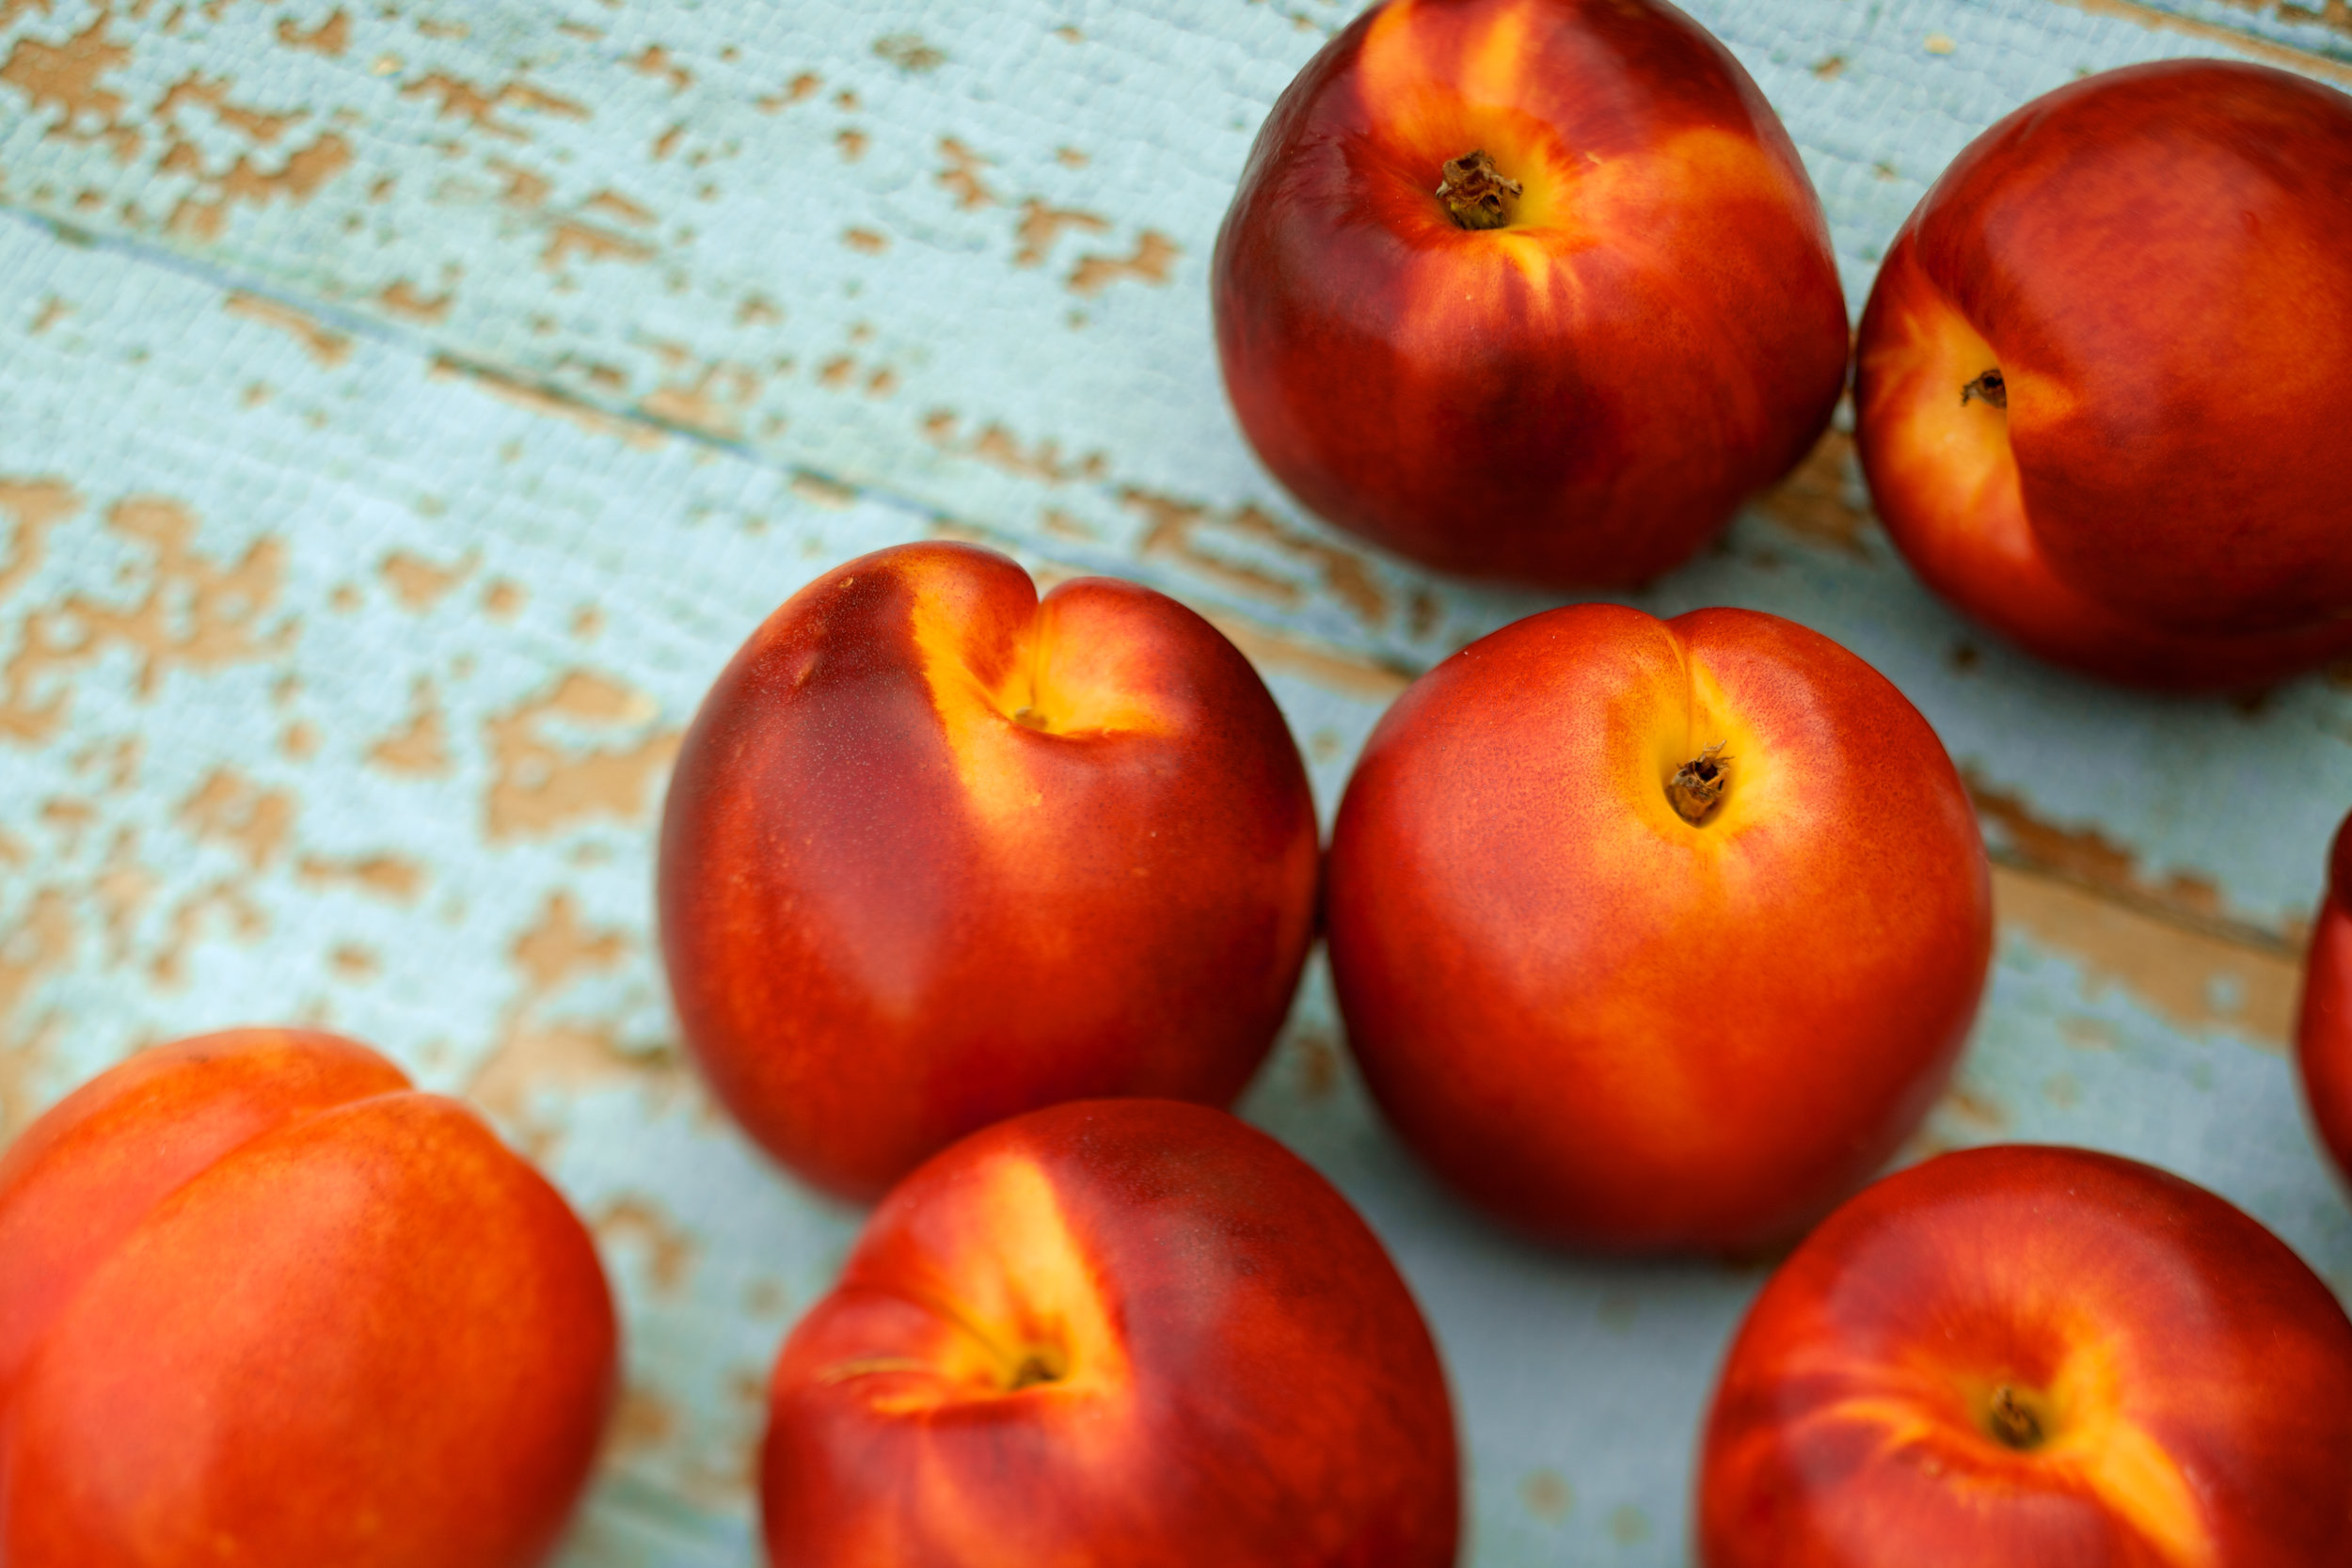 Fresh-organic-nectarines-on-rustic-wood-table-476389116_5616x3744.jpeg